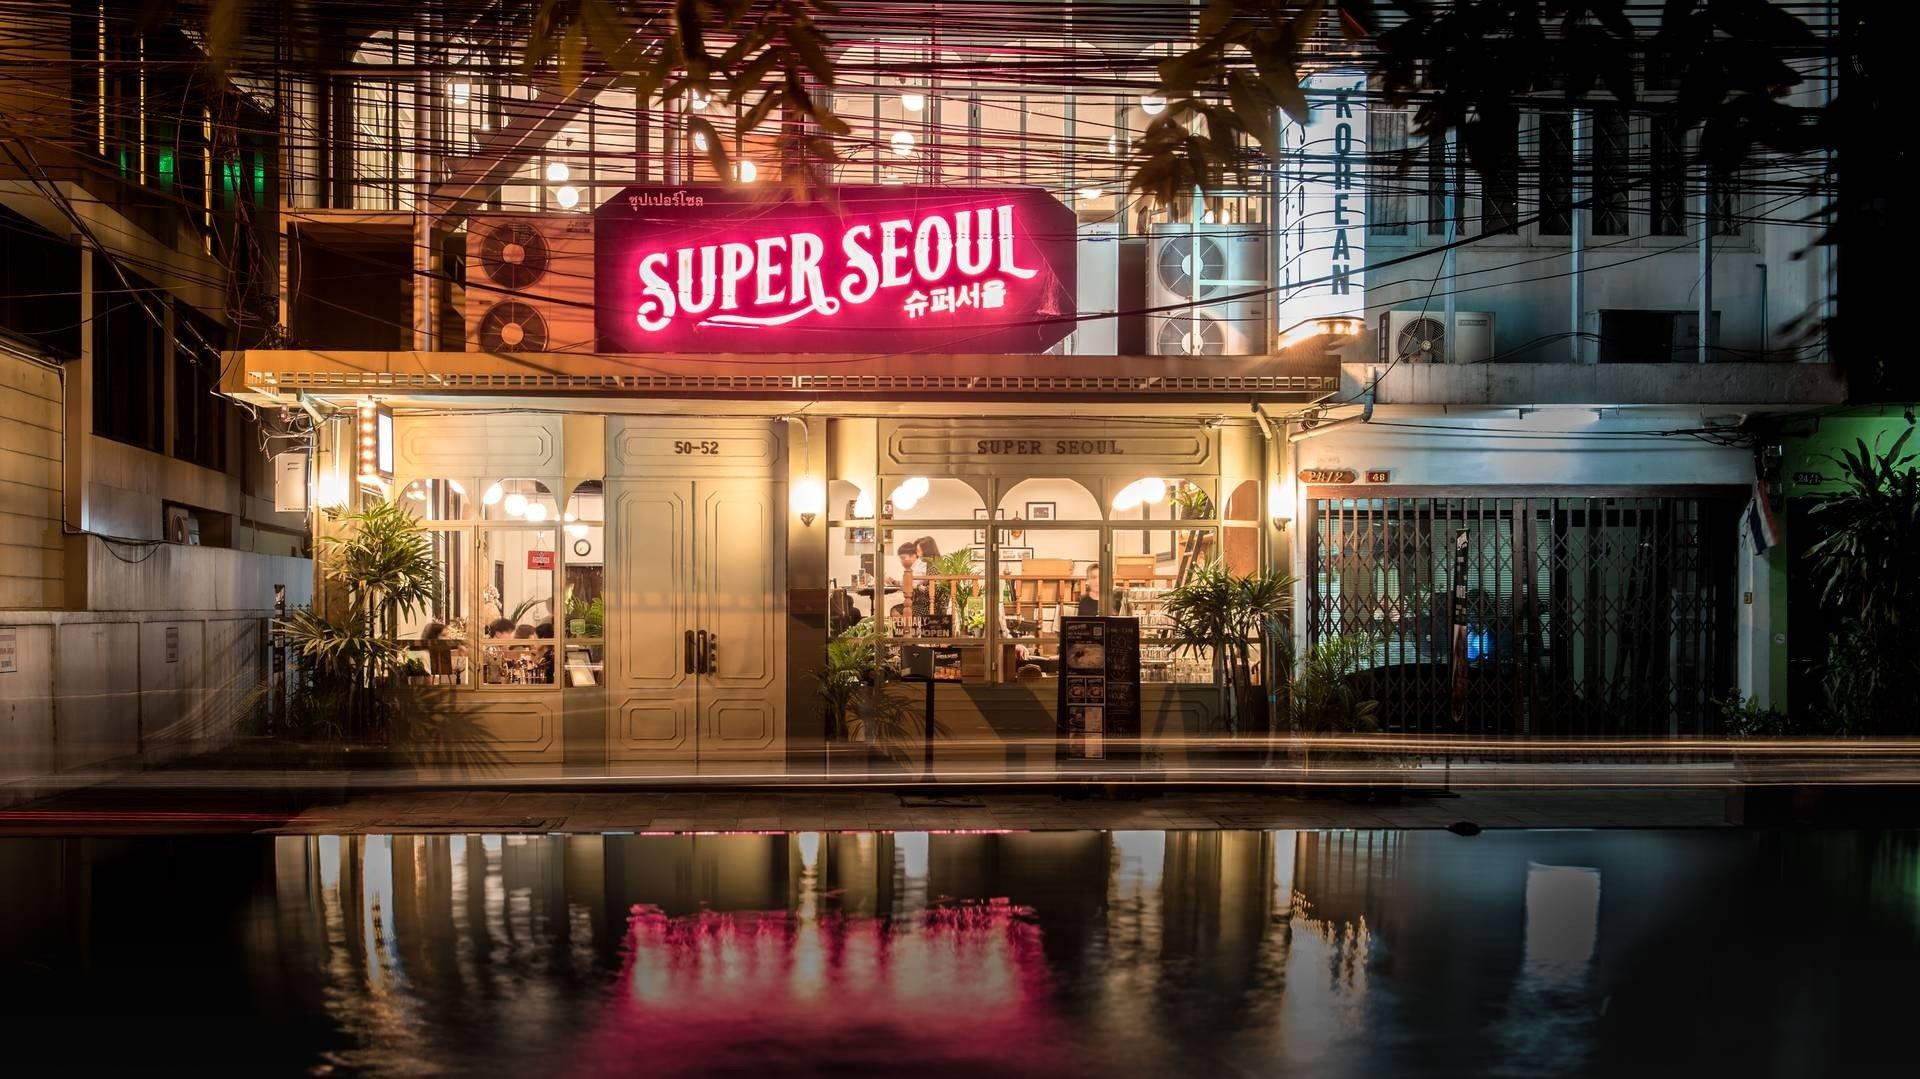 SUPER SEOUL CAFE